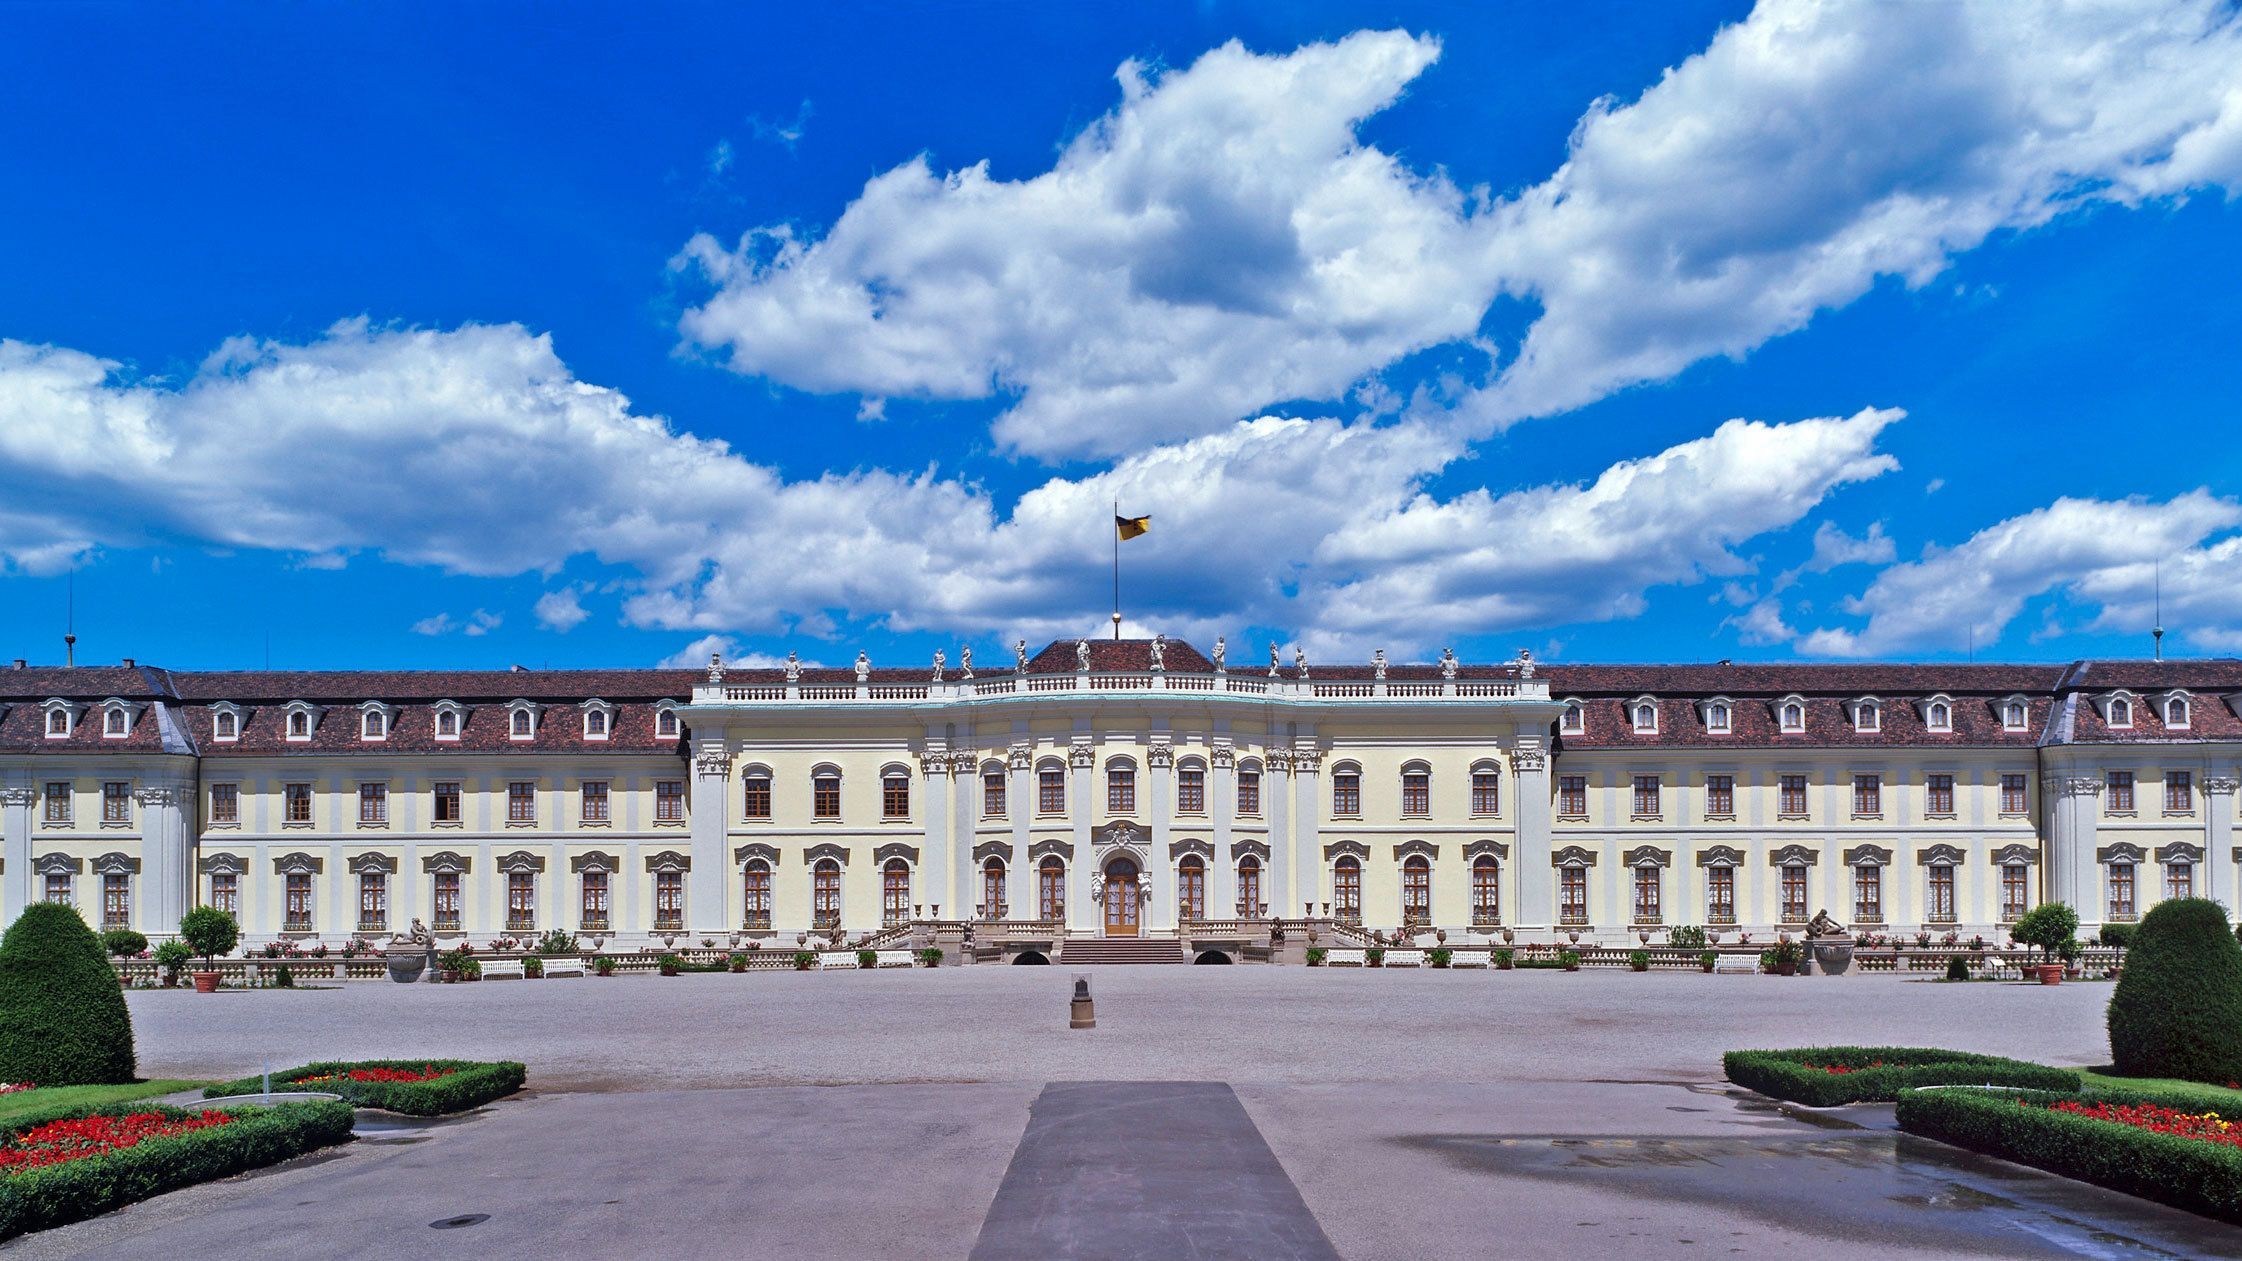 Full-Day Ludwigsburg Palace & Maulbronn Monastery Tour from Frankfurt